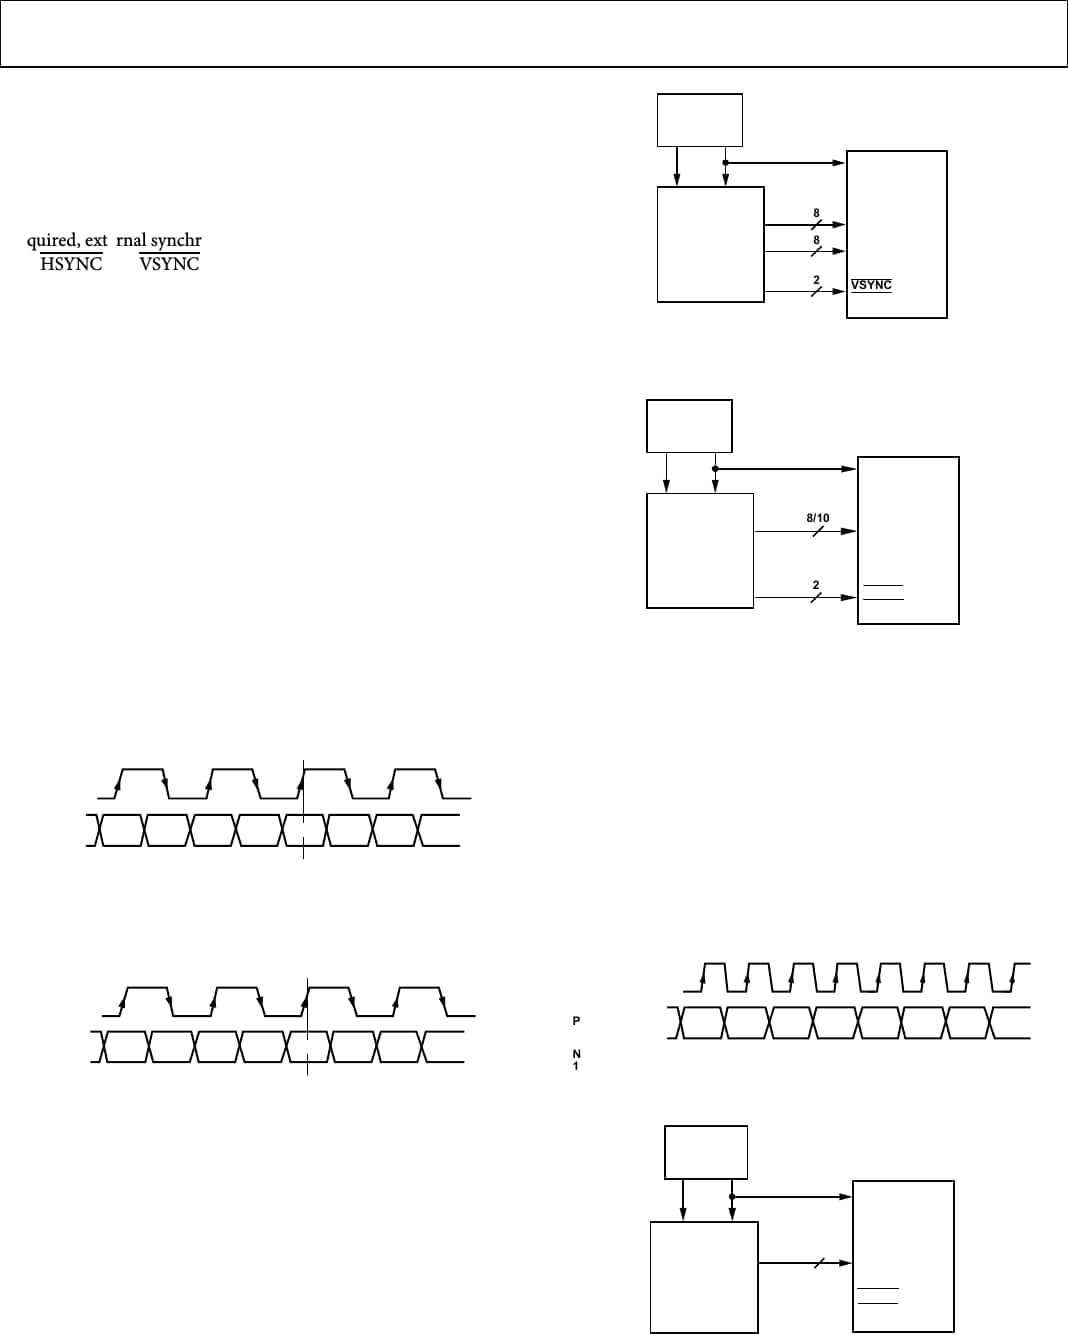 hight resolution of telephone wiring diagram for tran 2012a wiring diagram databaseadv7390 93 datasheet analog devices digikey telephone wiring